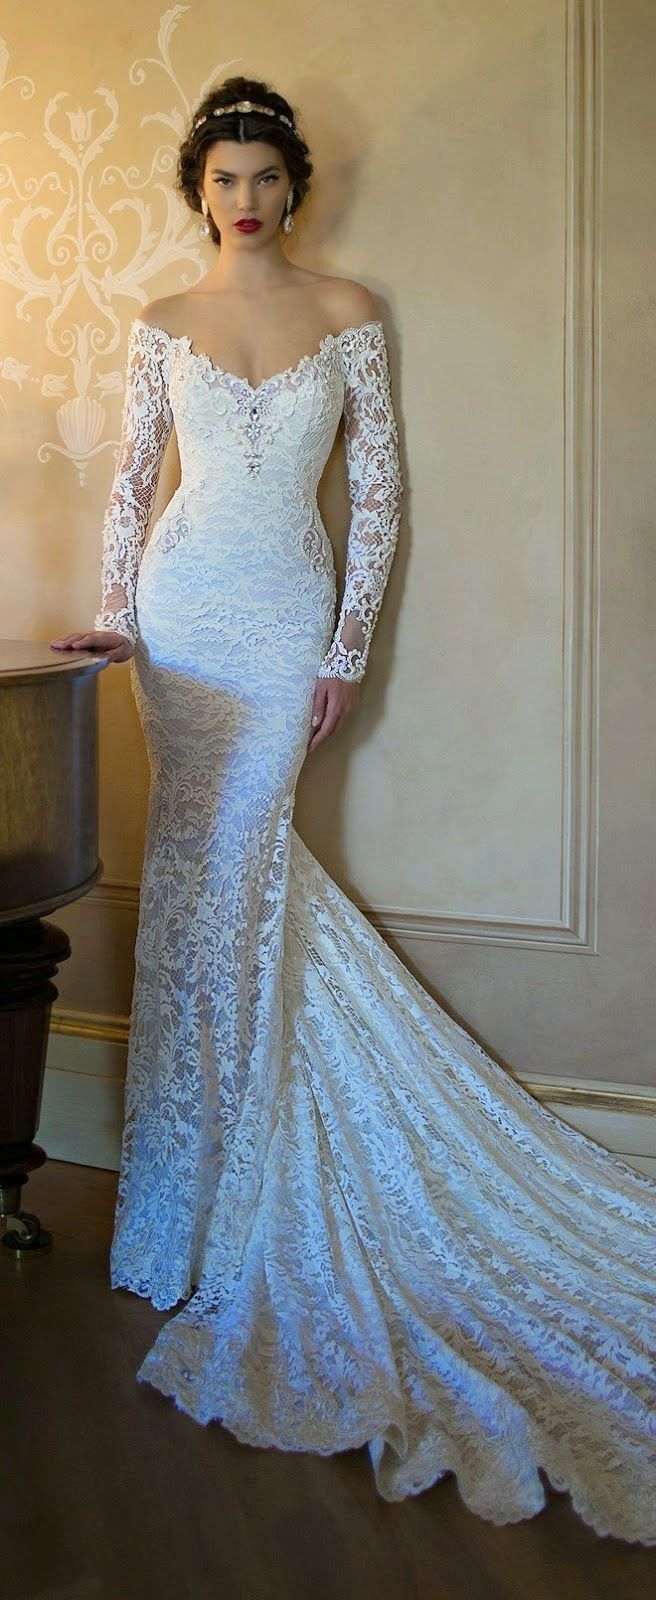 Best wedding dresses lace wedding dress wedding dresses